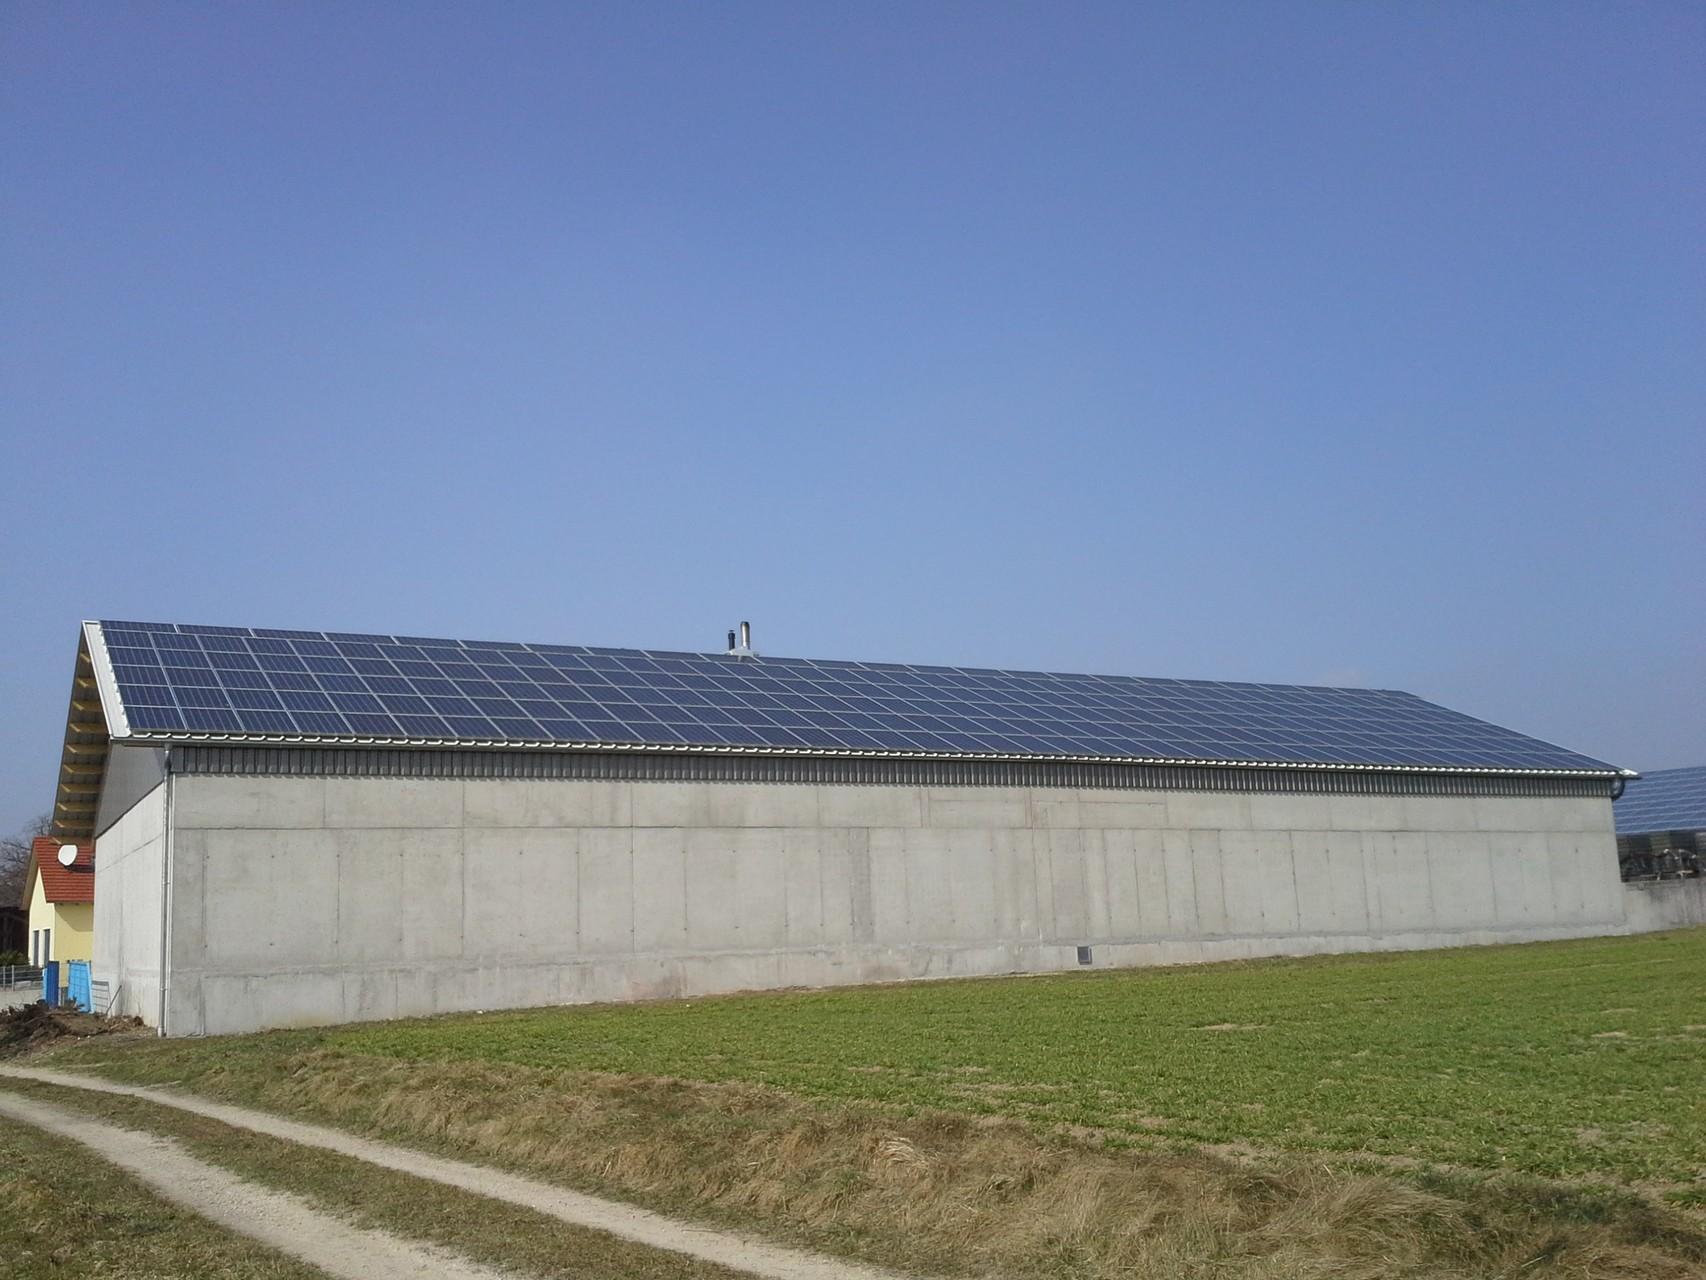 130 kWp Photovoltaikanlage 93351 Maierhofen SHARP Modulen